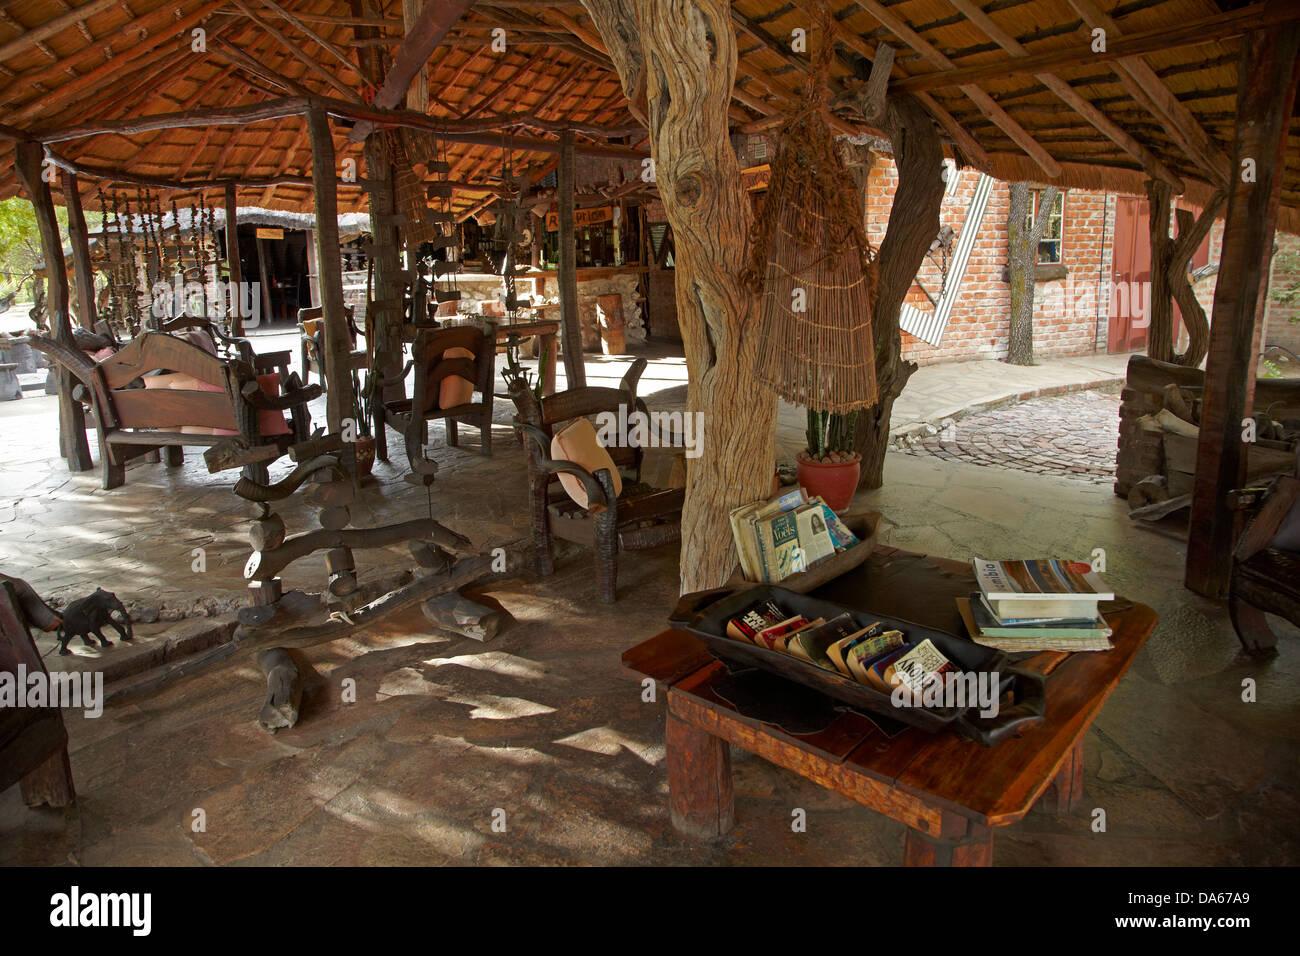 Rustikale Bar rustikale bar roys rest c in der nähe grootfontein namibia